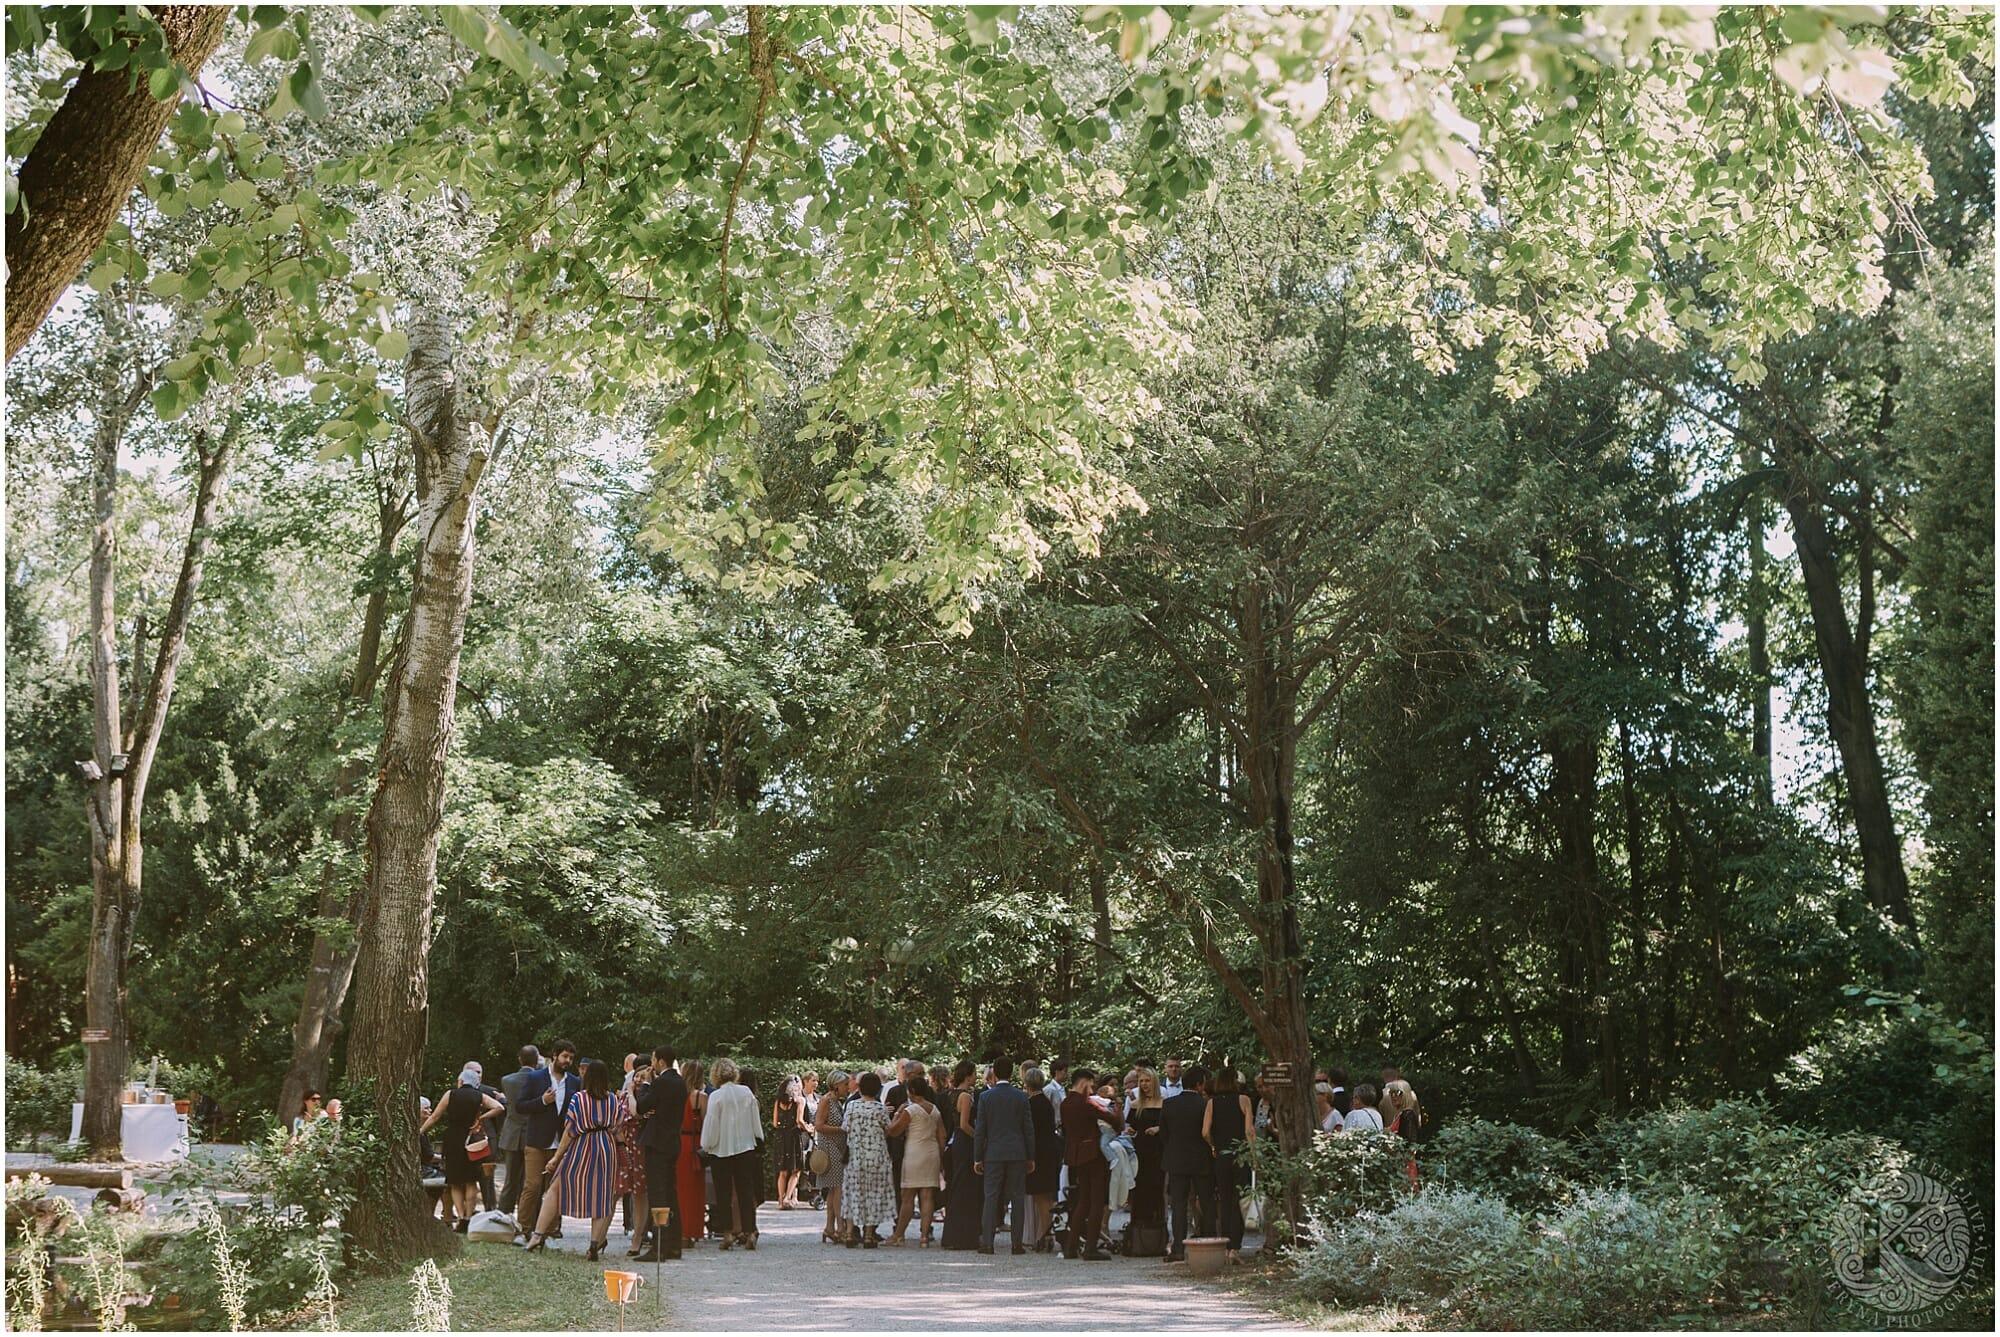 Kateryna-photos-photographe-mariage-chateau-des-3-fontaines-provence-avignon-vaucluse-sud_0035.jpg